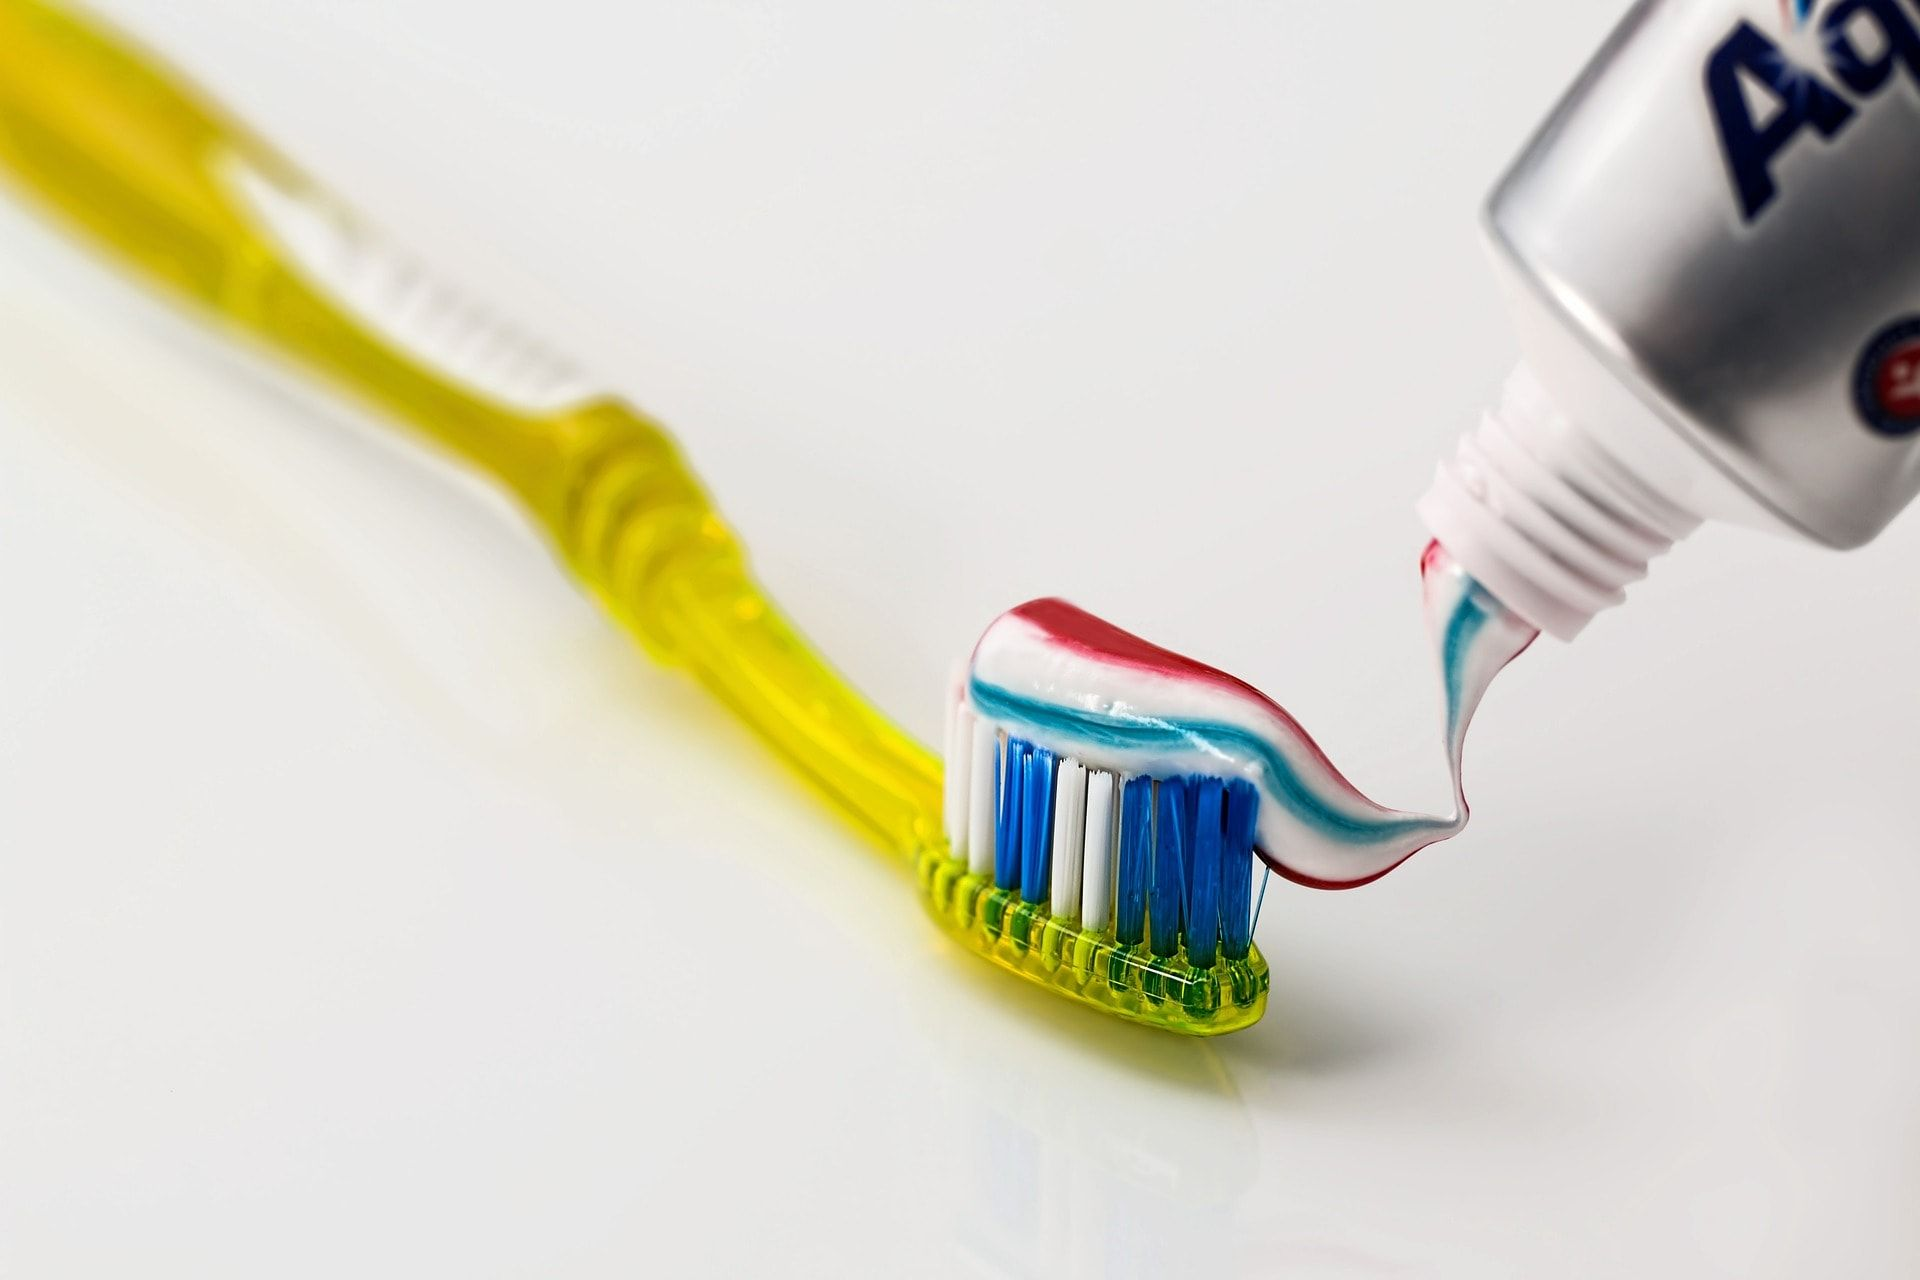 choosing the proper toothbrush